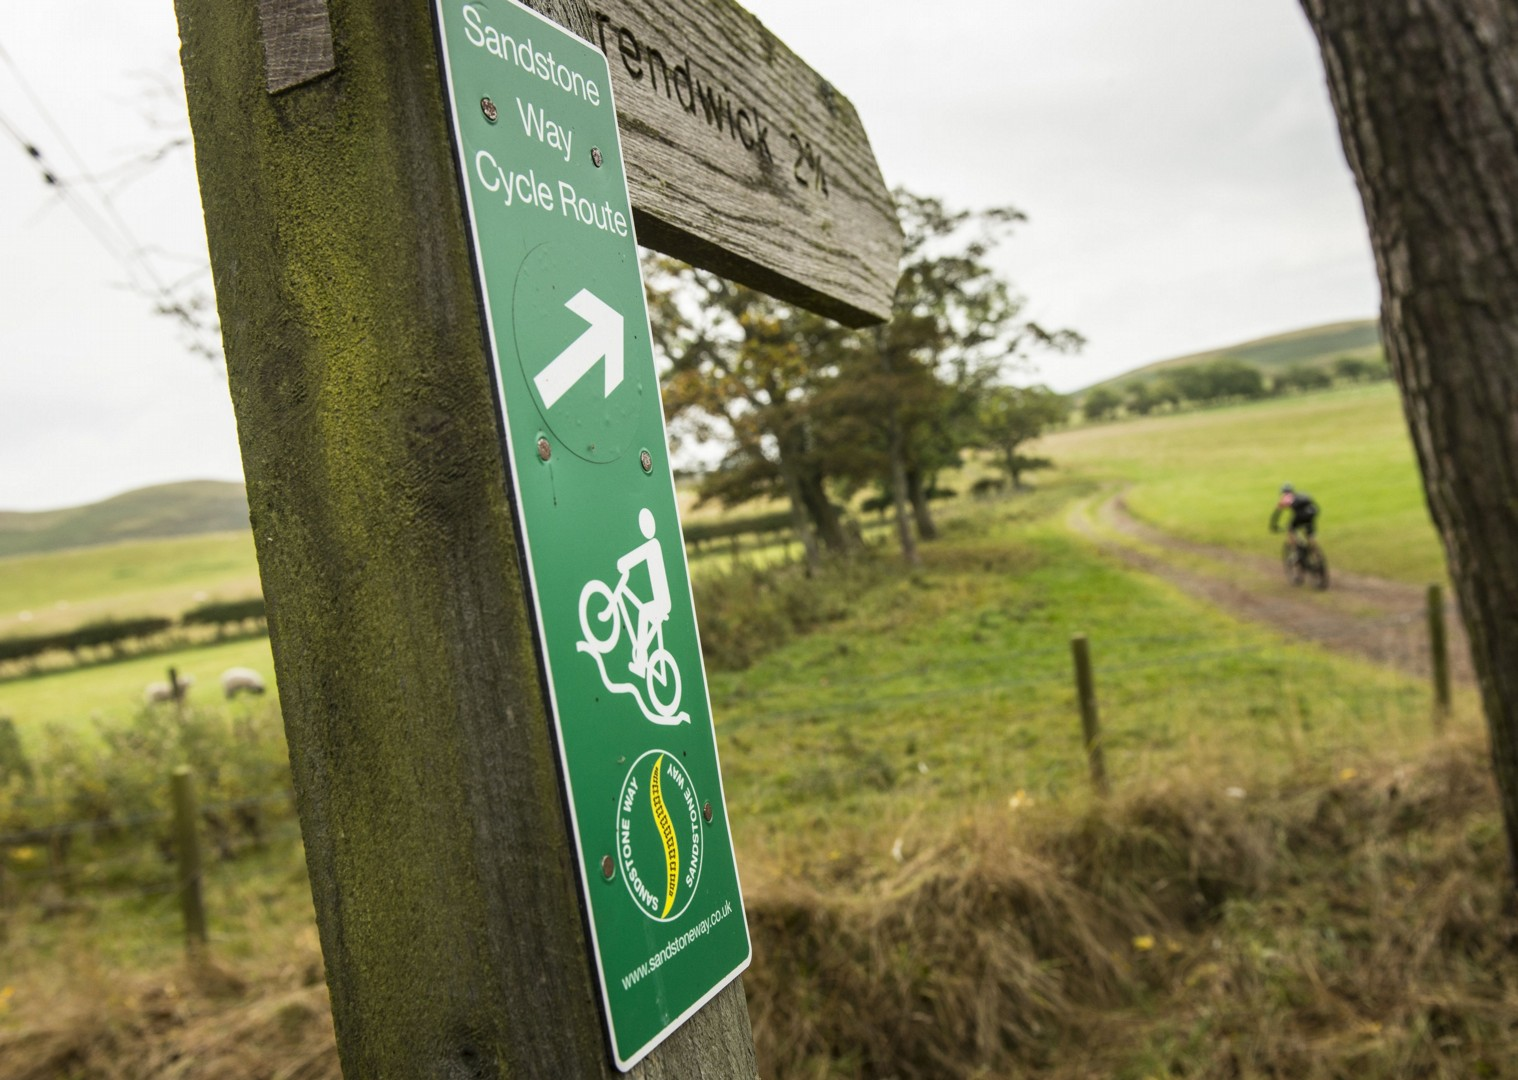 sandstone-way-rothwell-156.jpg - UK - Northumberland - Sandstone Way - Mountain Biking